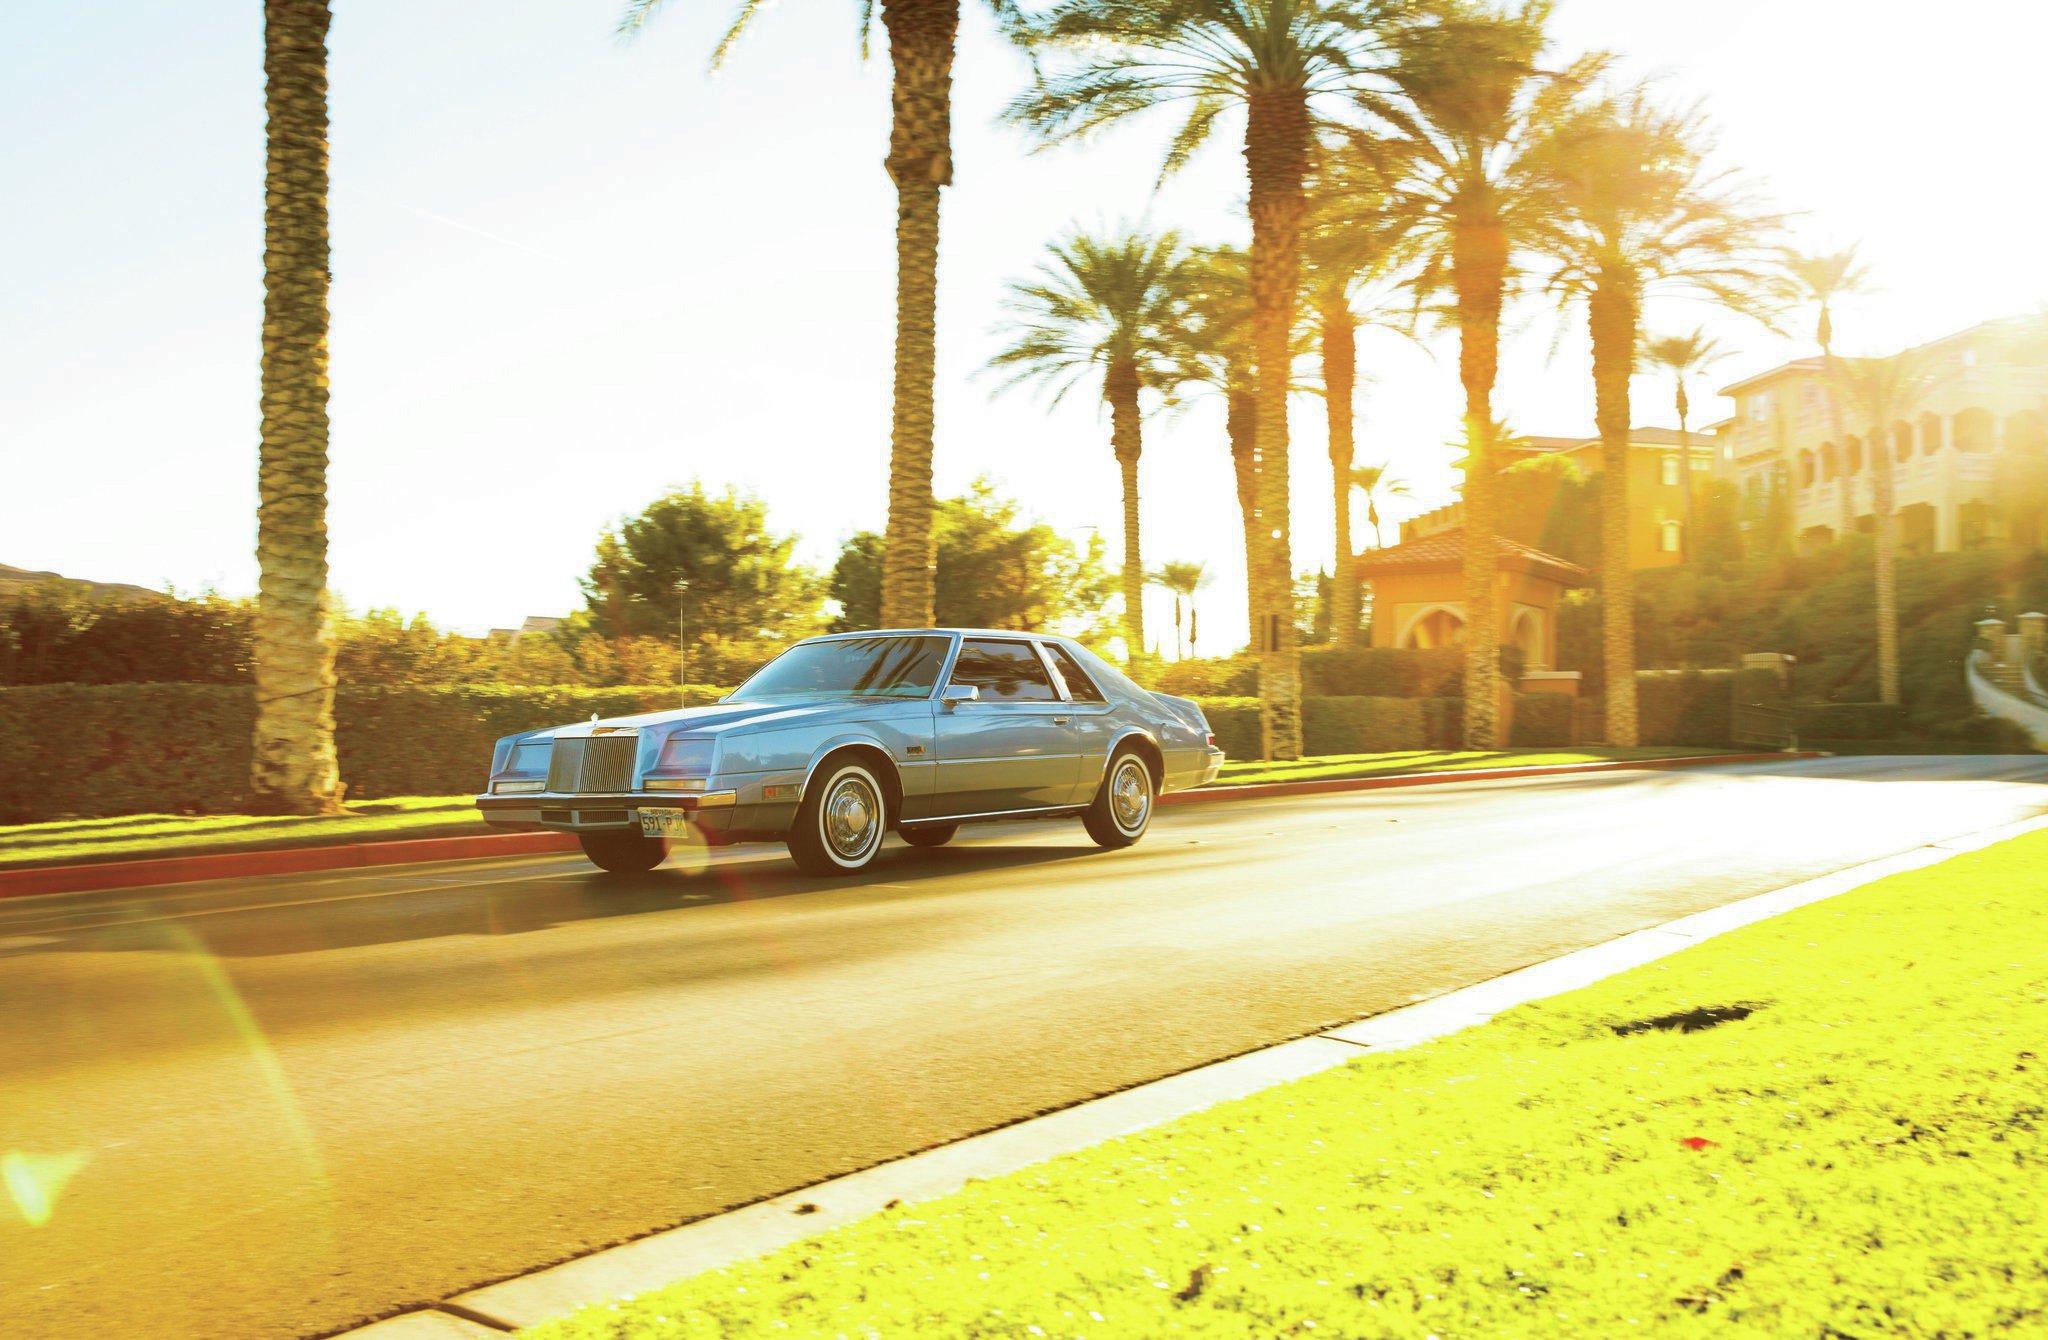 http://st.automobilemag.com/uploads/sites/11/2014/08/1981-1983-Chrysler-Imperial-front-three-quarter.jpg